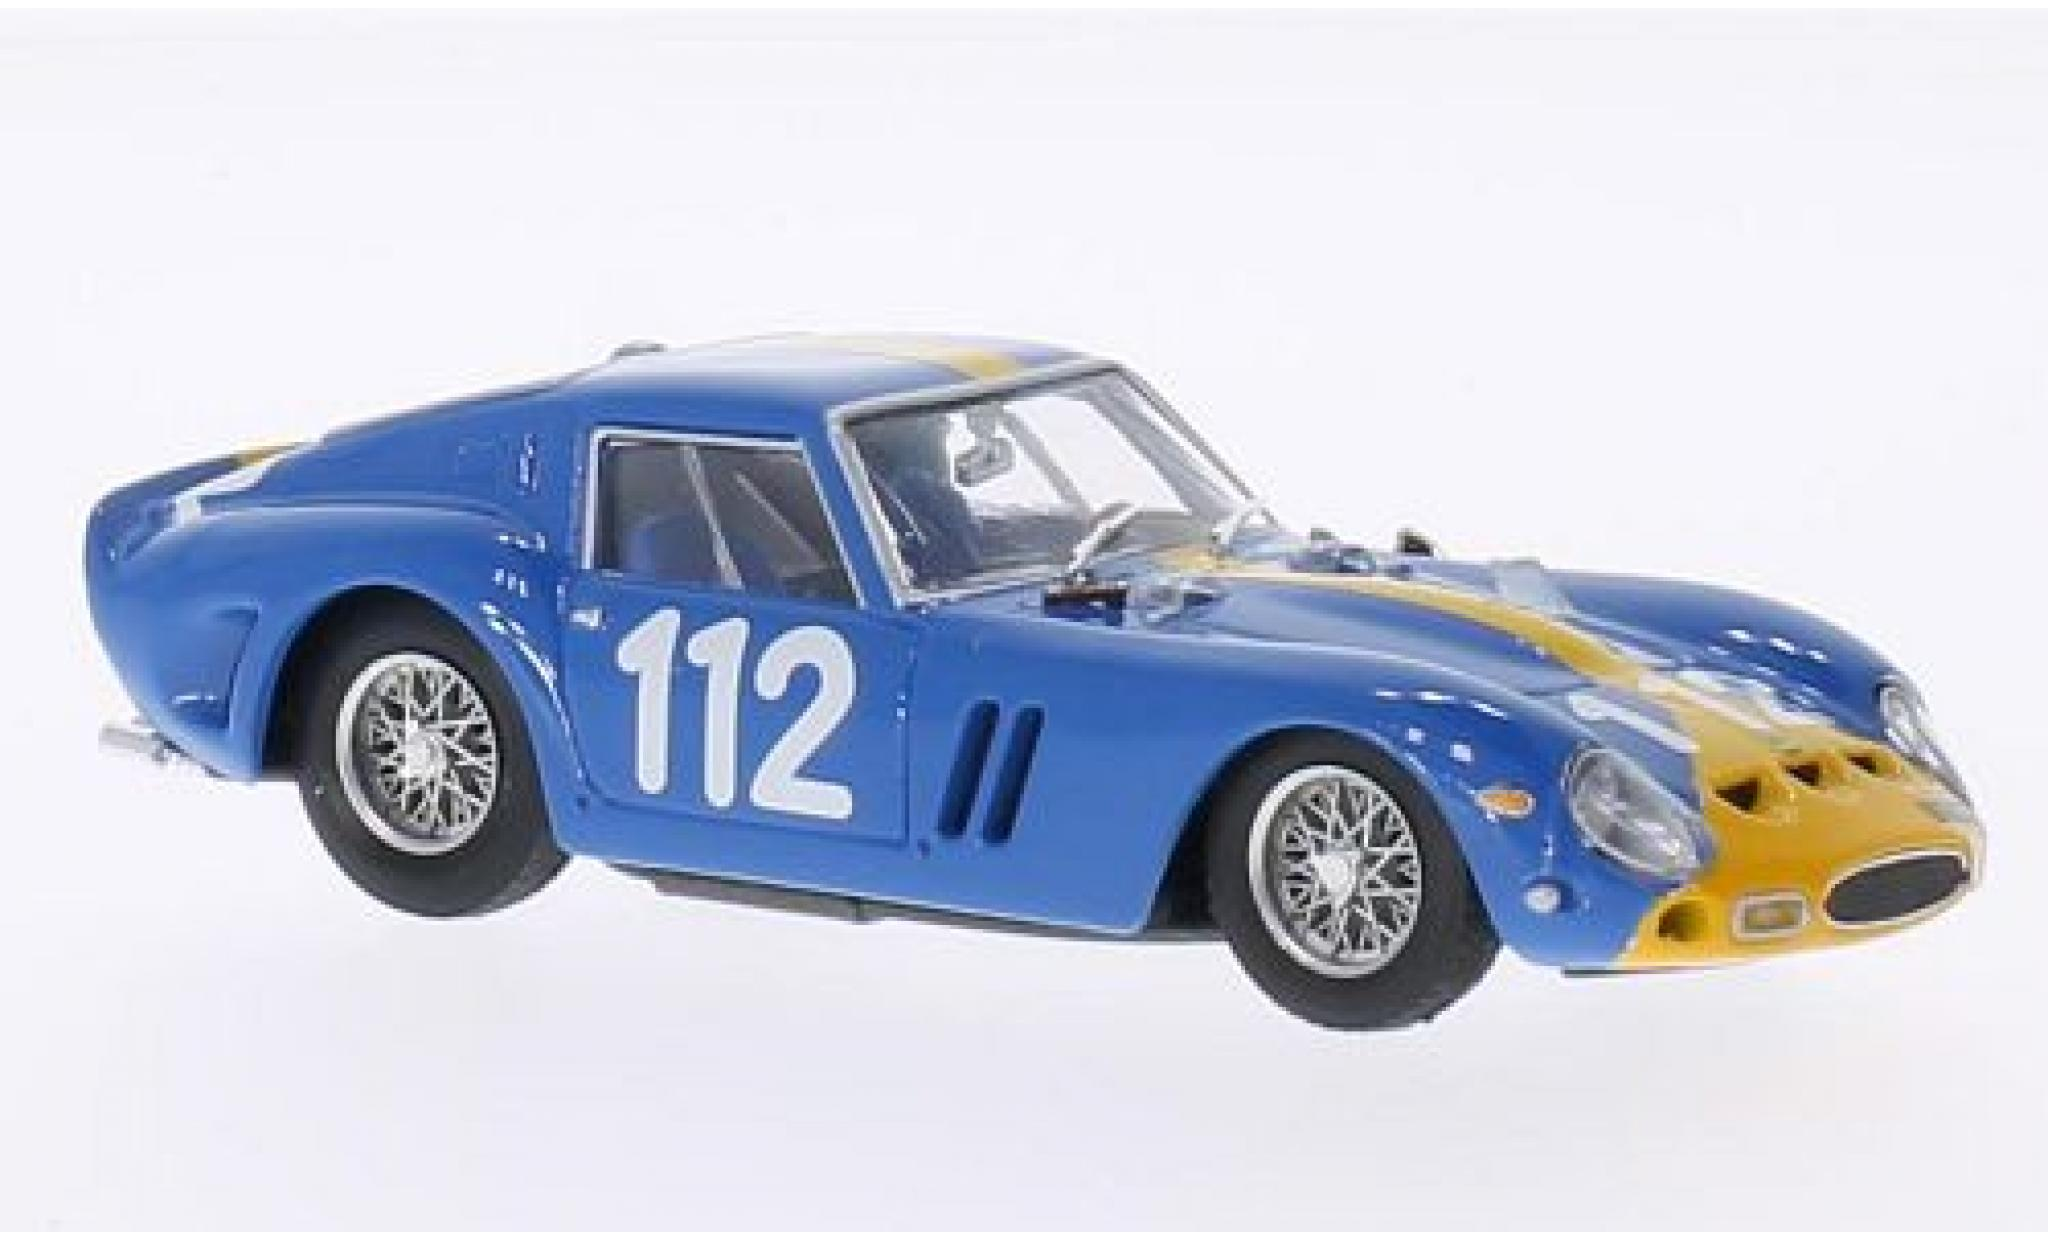 Ferrari 250 1/43 Brumm GTO No.112 Targa Florio 1964 châssis 3445GT U.Norinder/P.Troberg